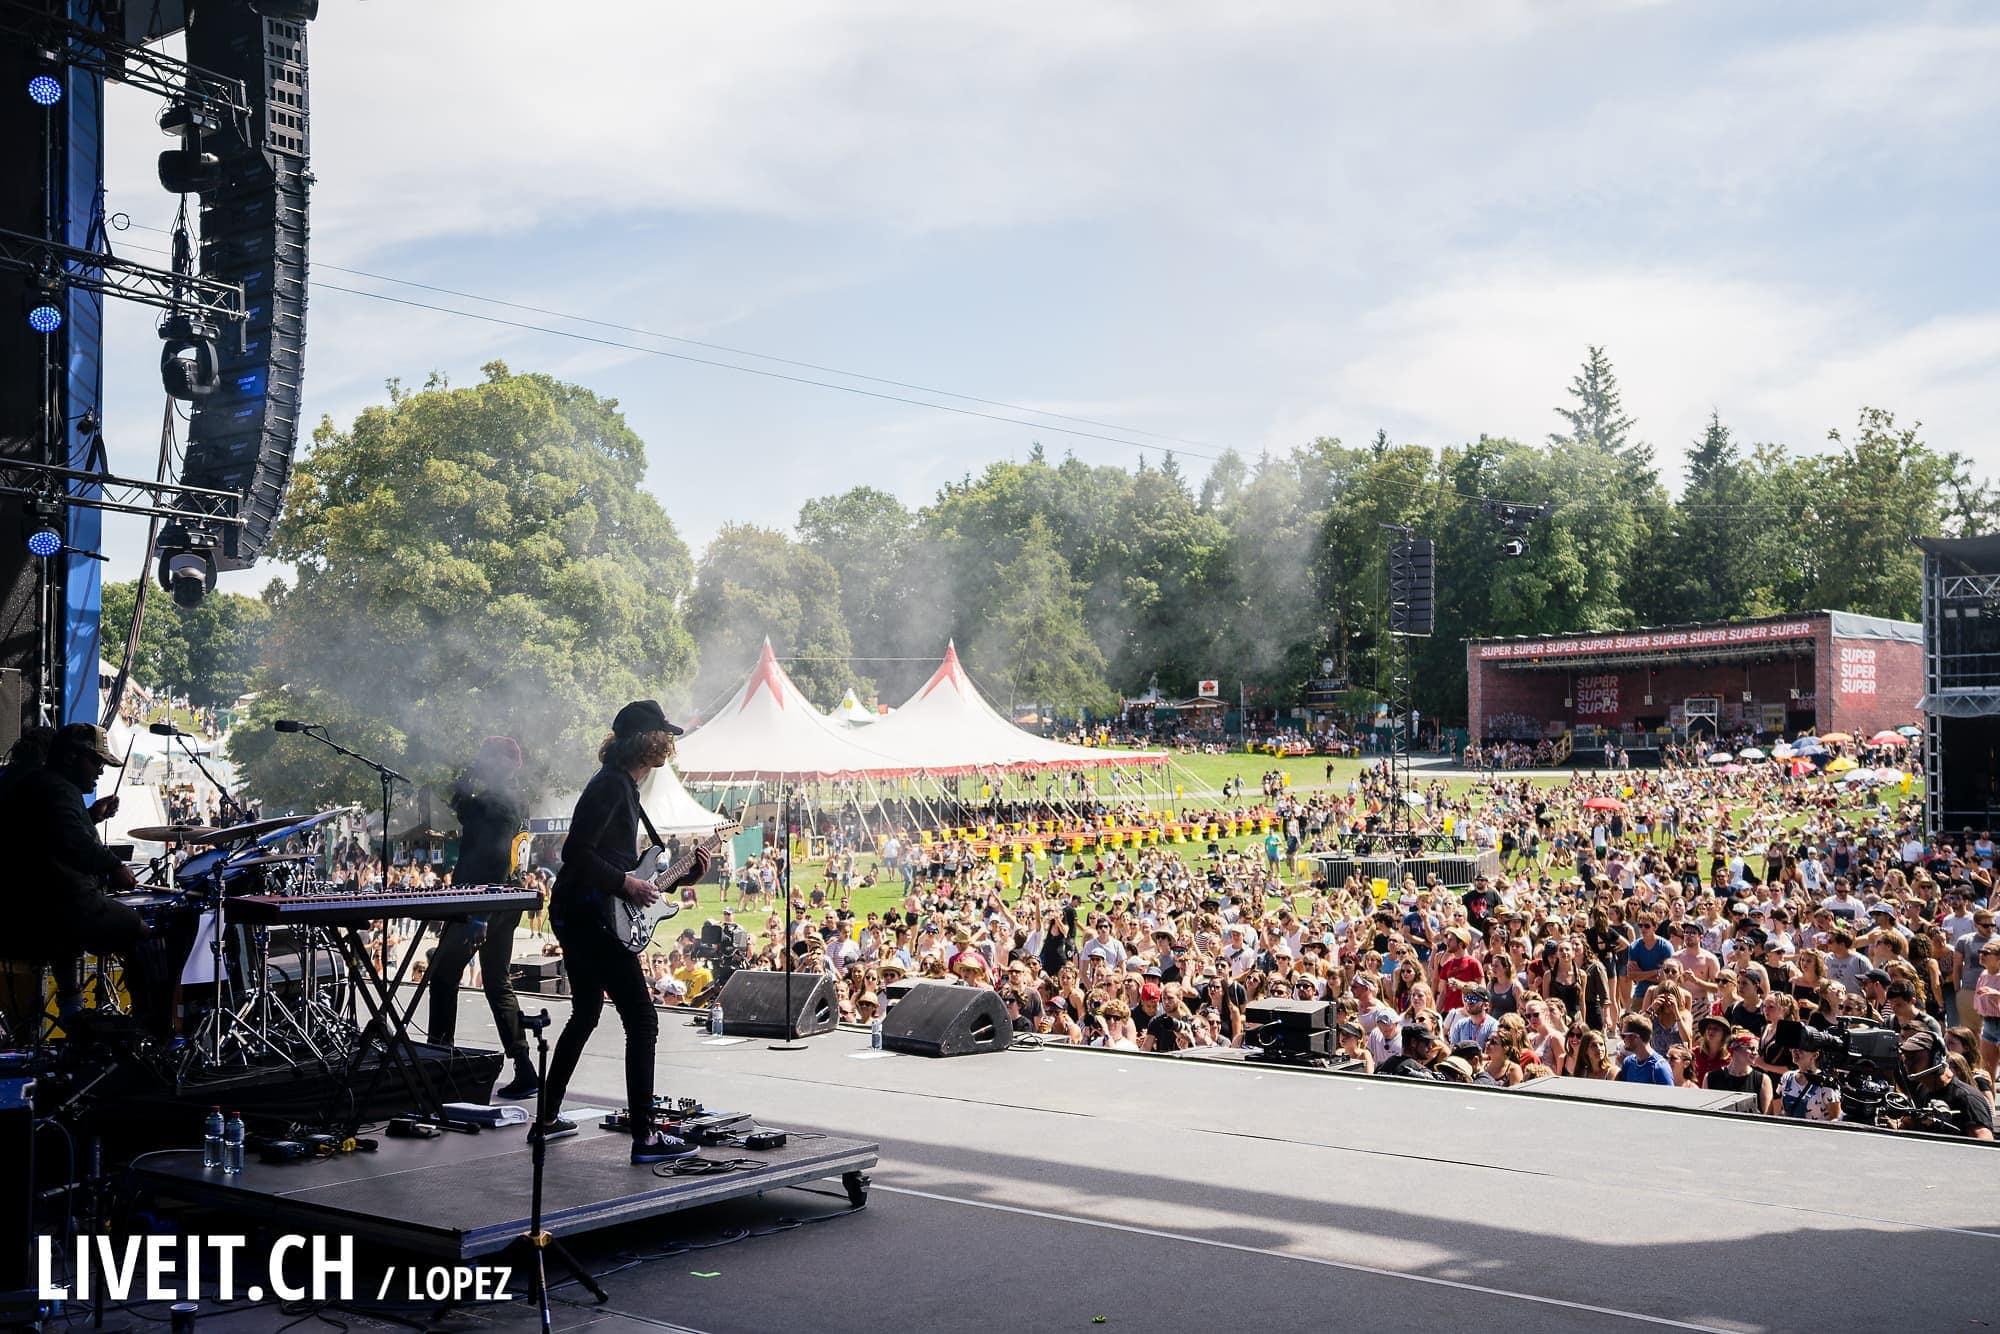 Jacob Banks fotografiert am Gurtenfestival 2018 in Bern. (Manuel Lopez for Gurtenfestival)